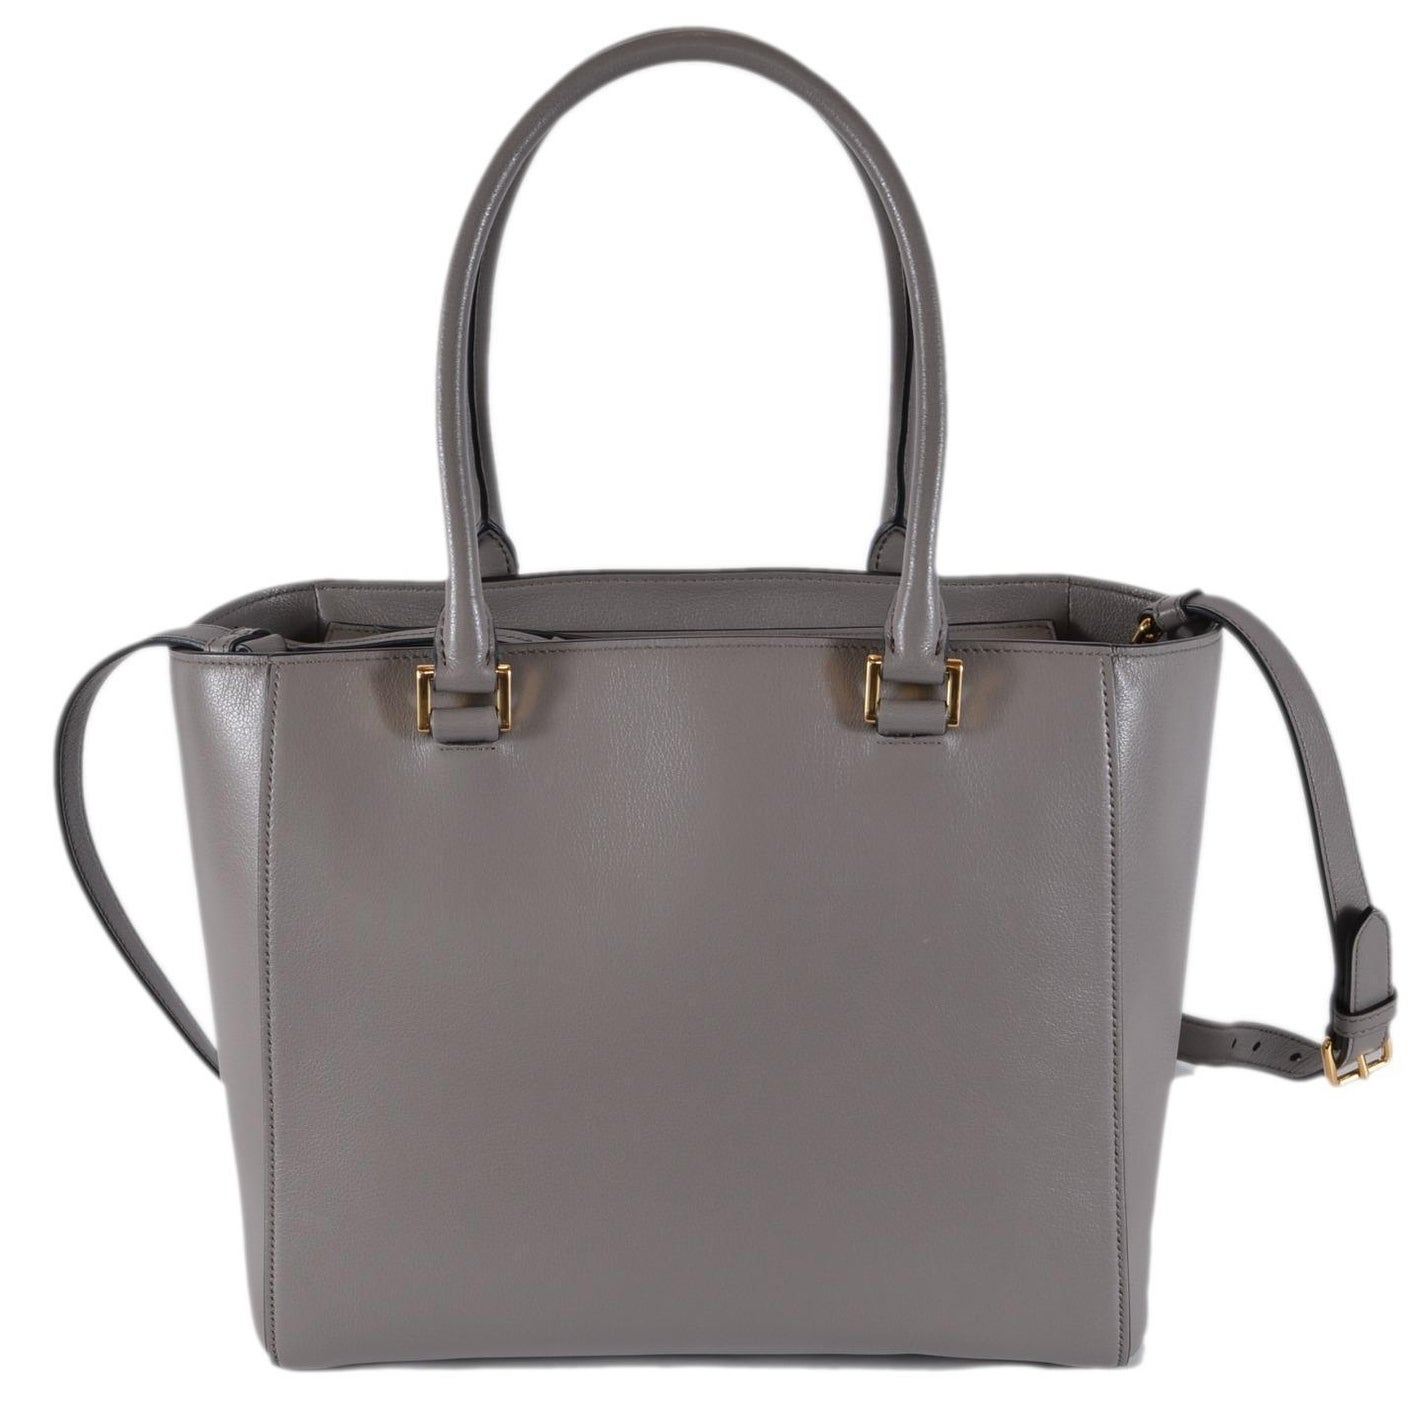 35aaab06259441 Prada 1BG227 Grey Glace Leather Medium Convertible Purse Handbag Tote